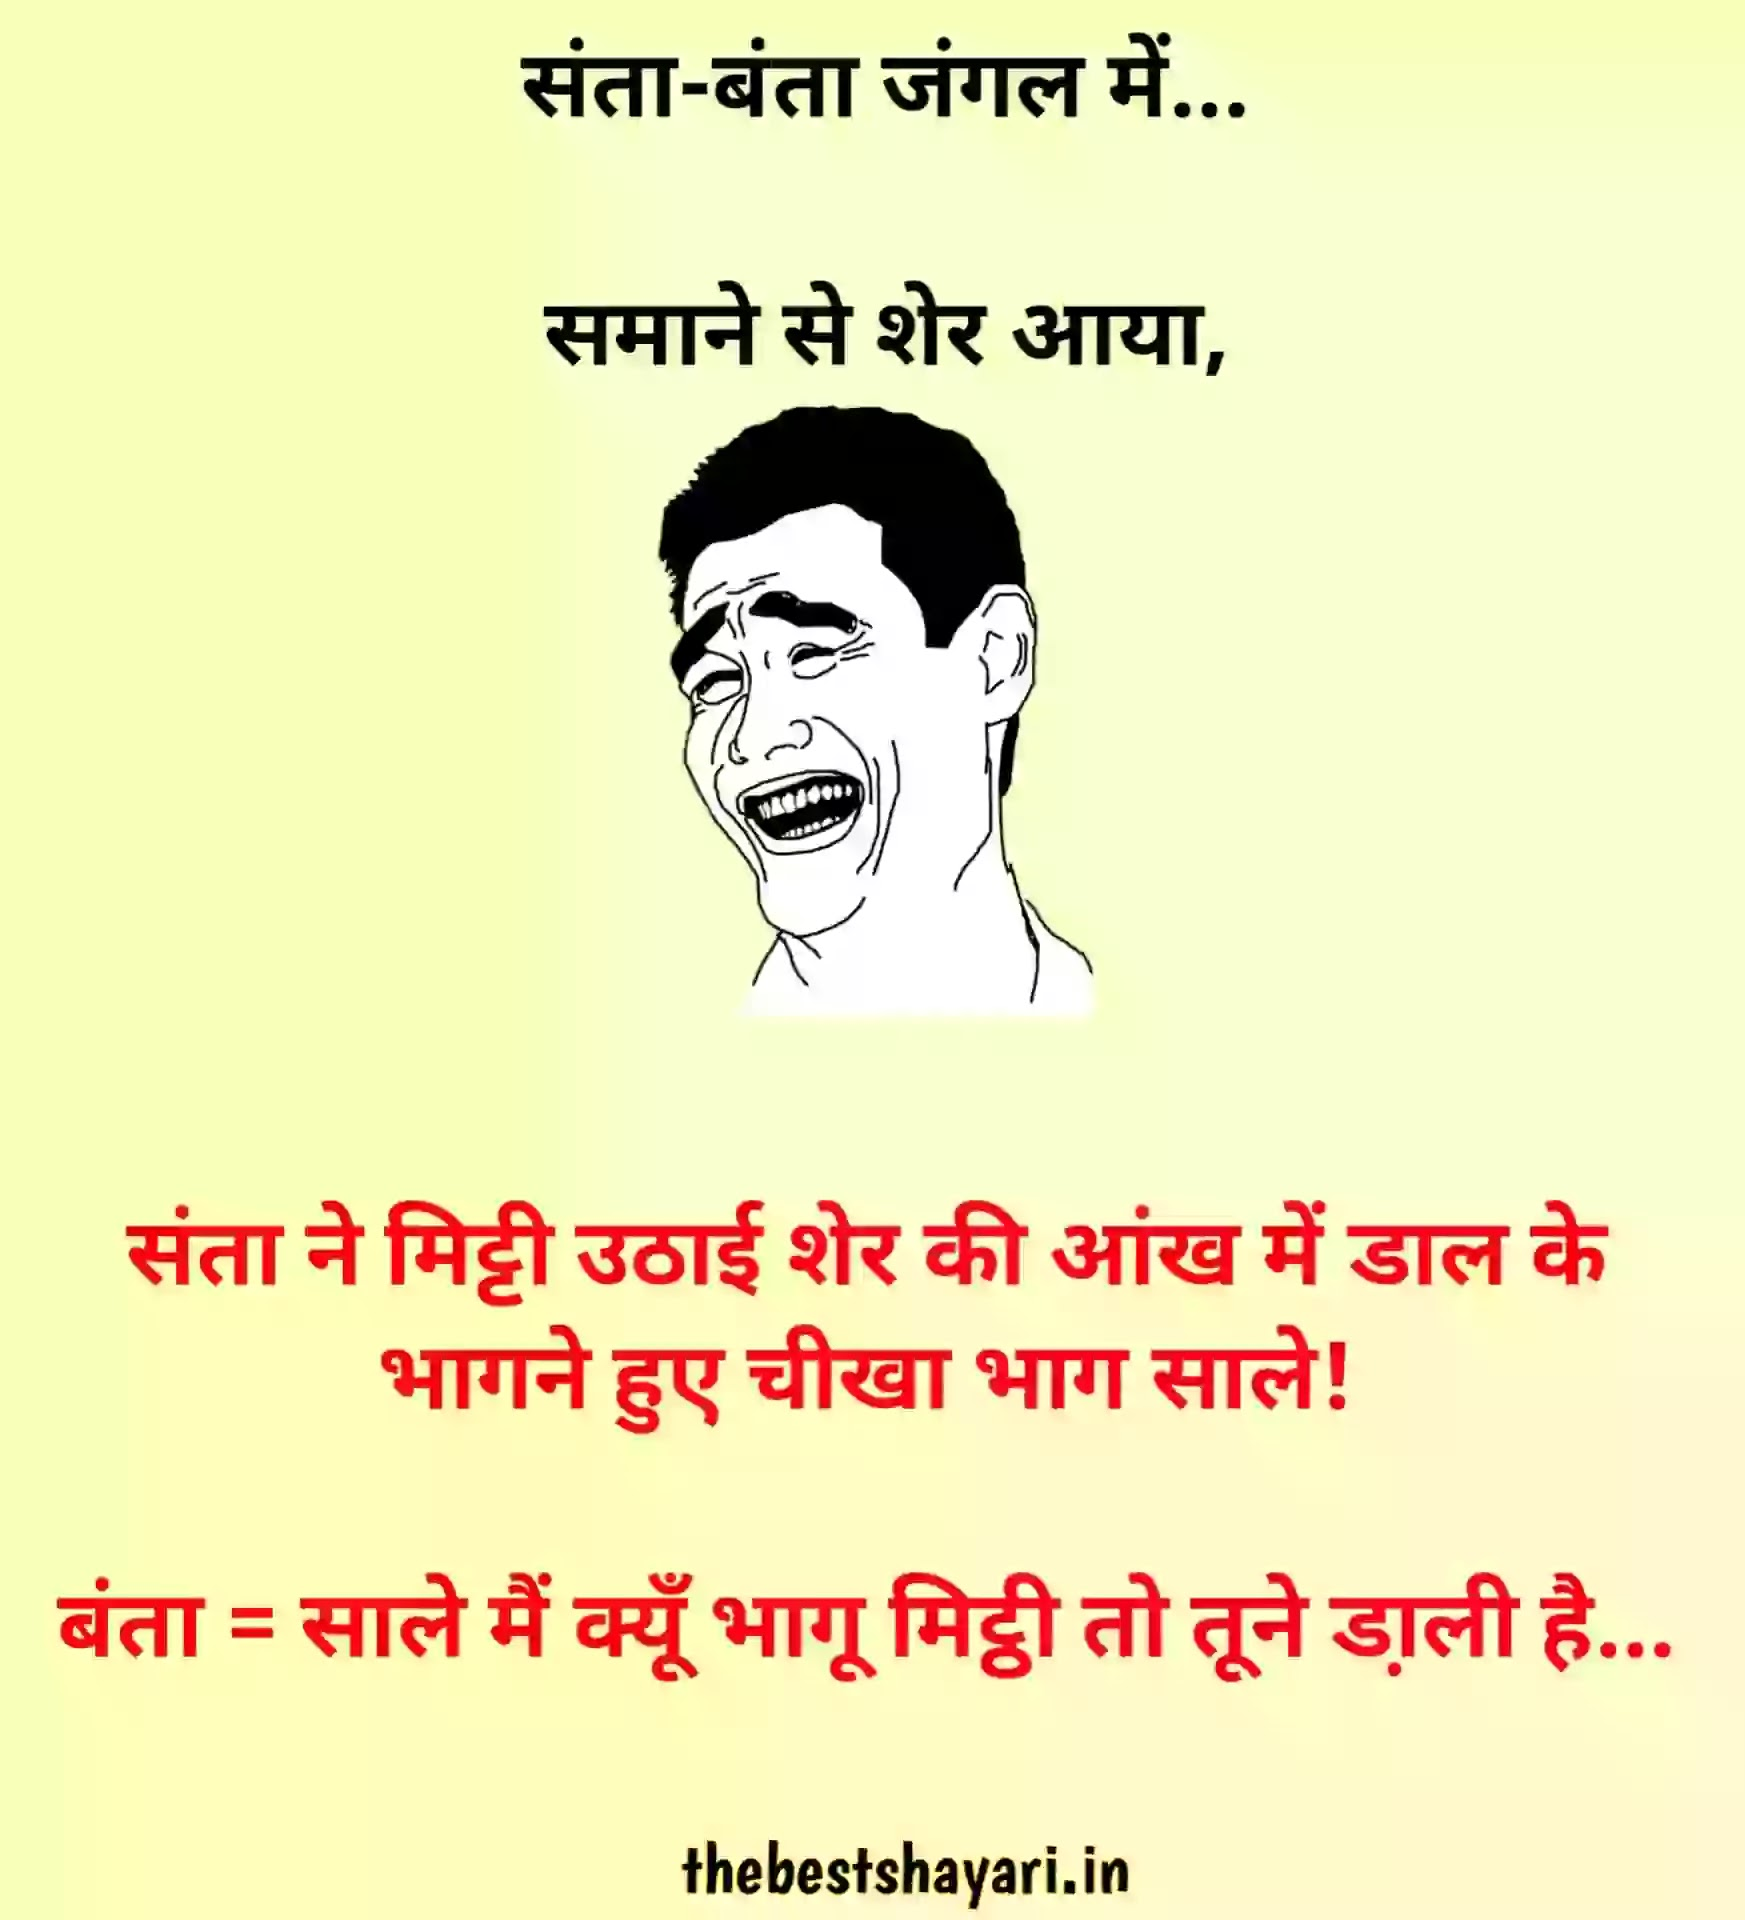 Hindi funny jokes in Hindi